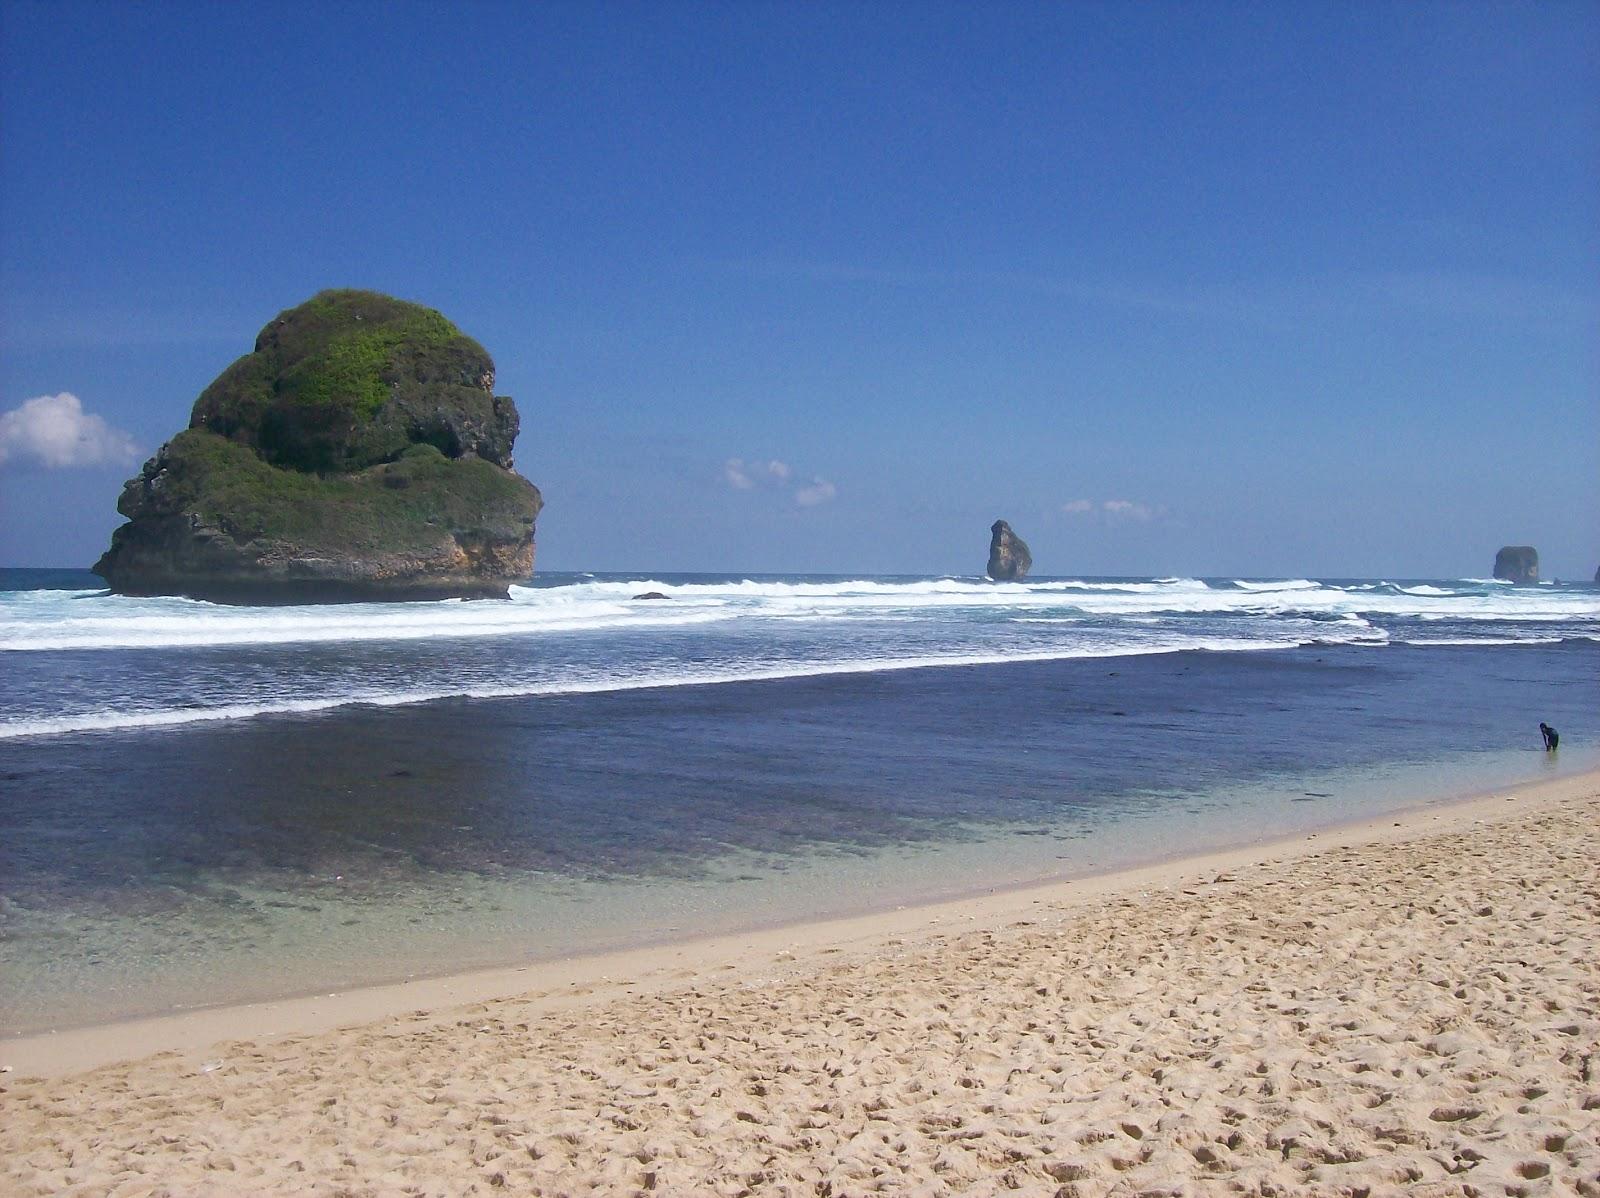 Lokasi Harga Tiket Masuk Pantai Goa Cina Malang Menikmati Keindahan